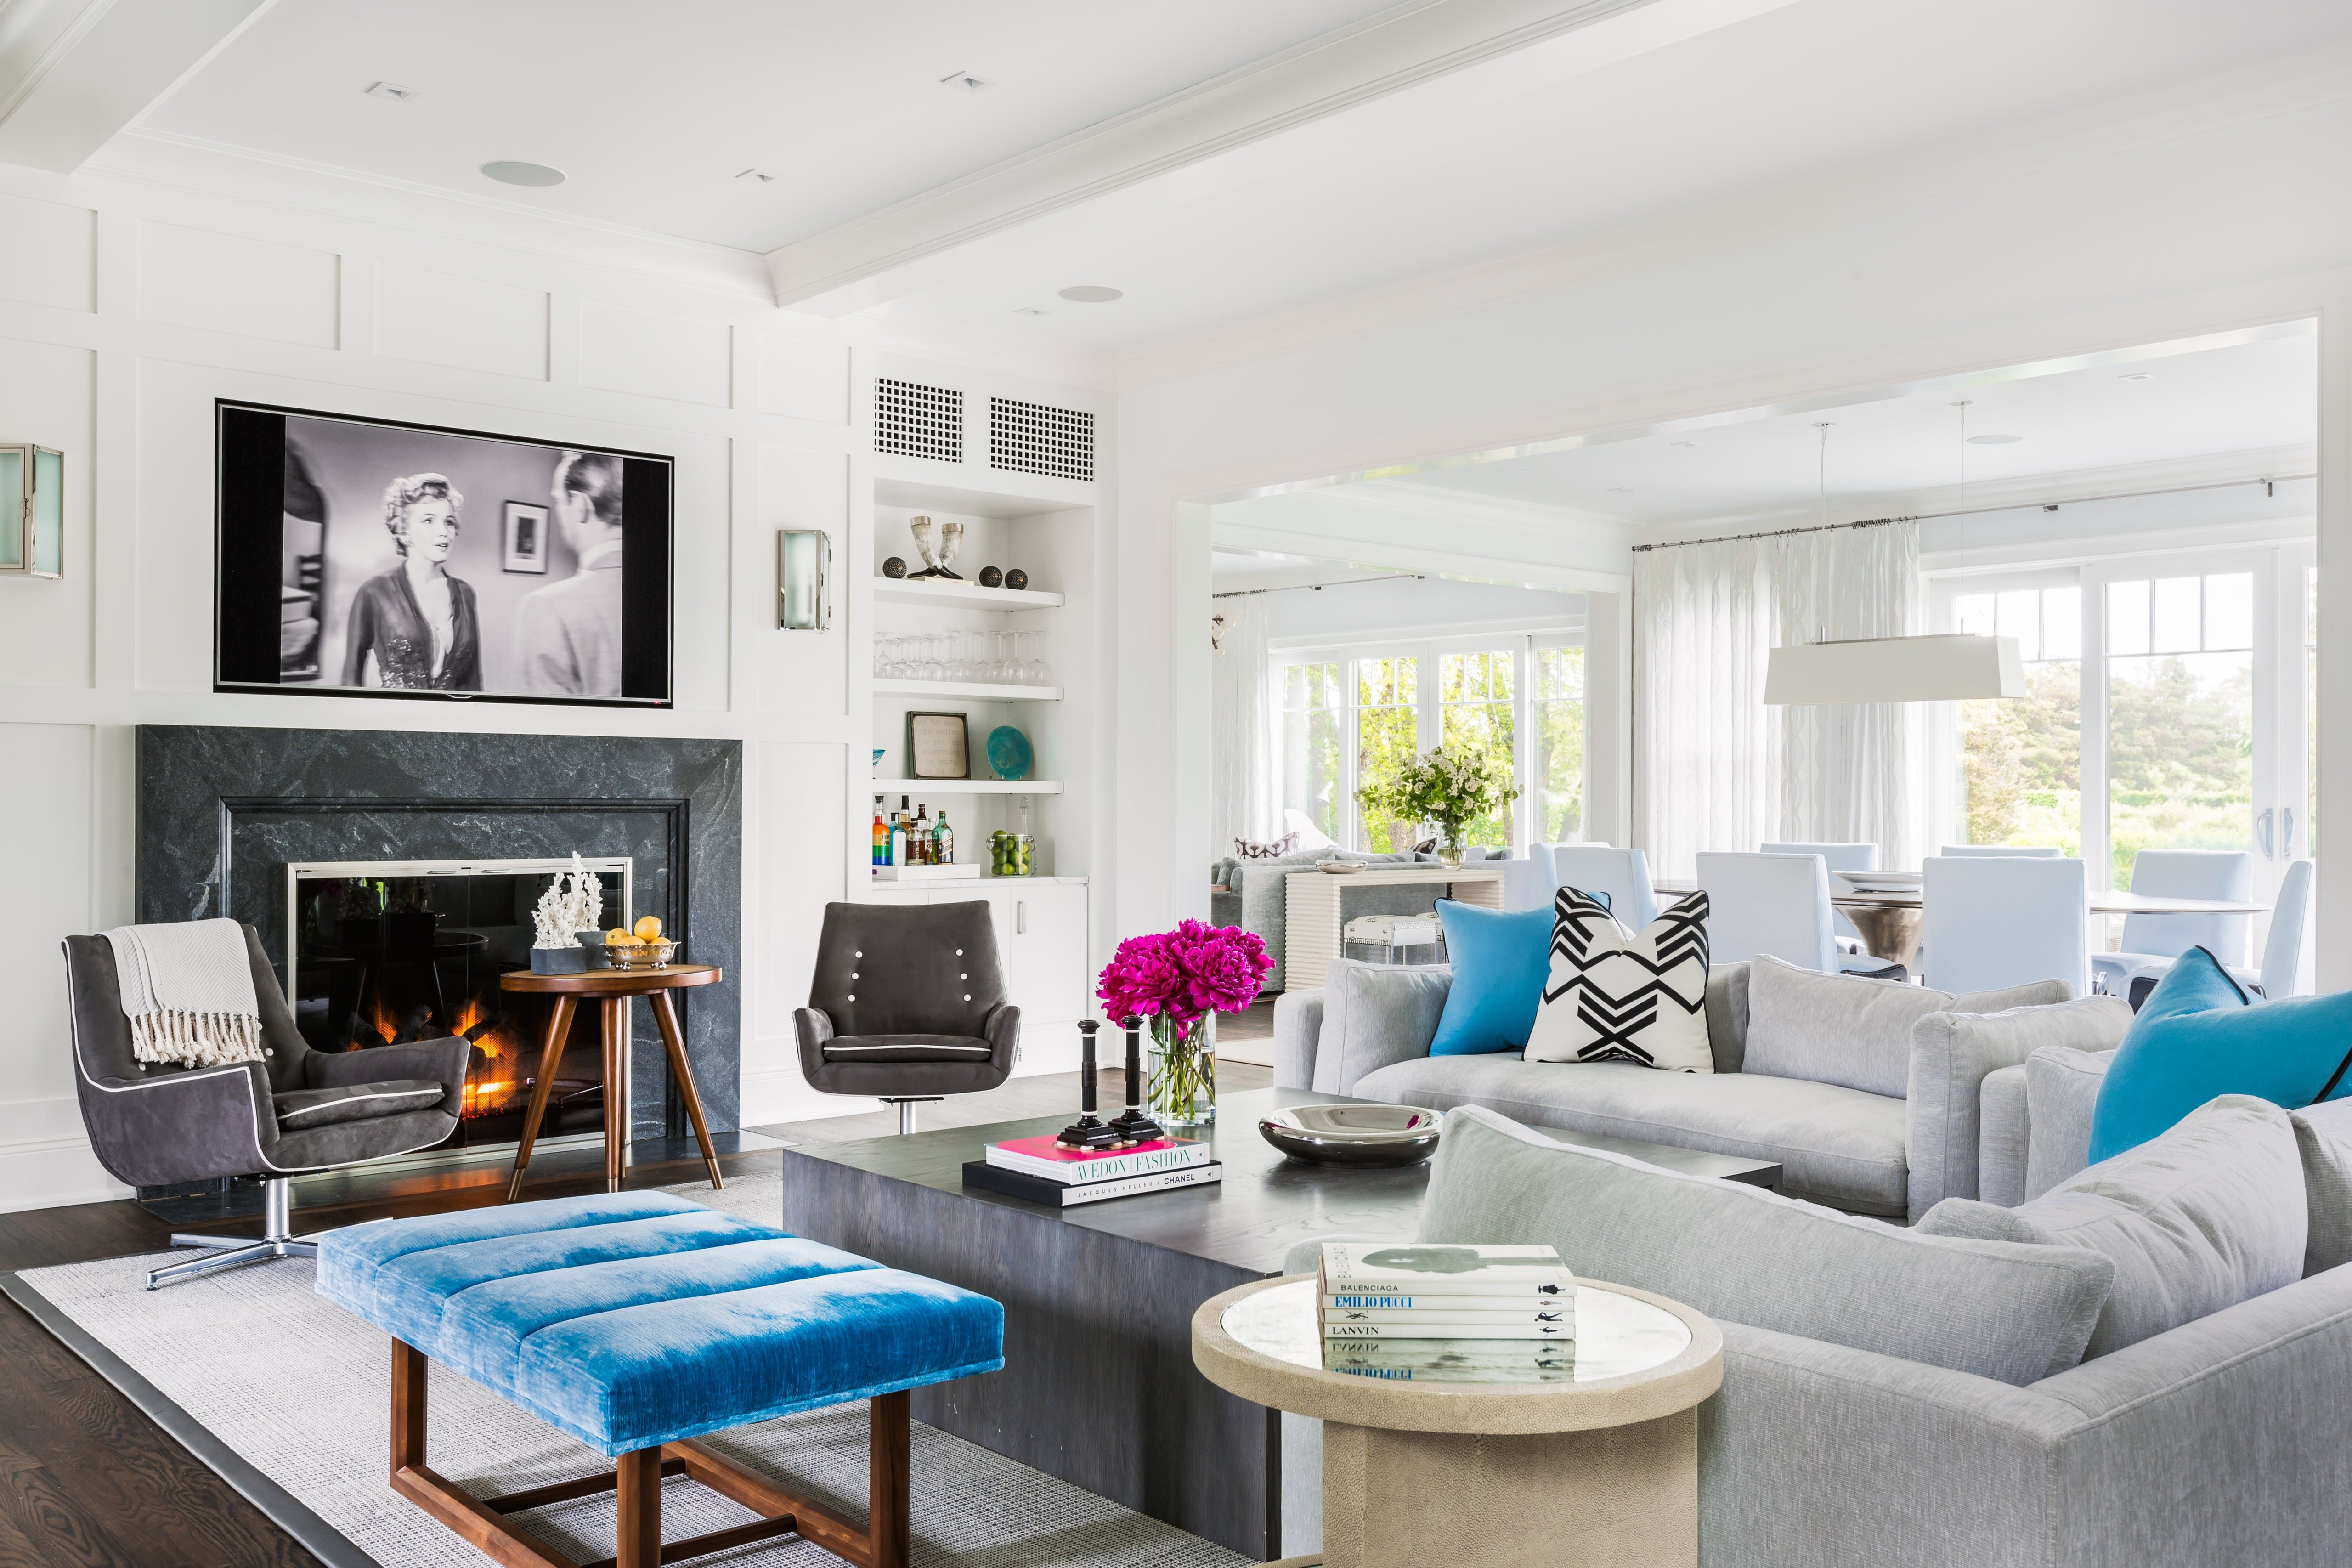 Alisberg parker architects portfolio interiors living 1501103165 2996204